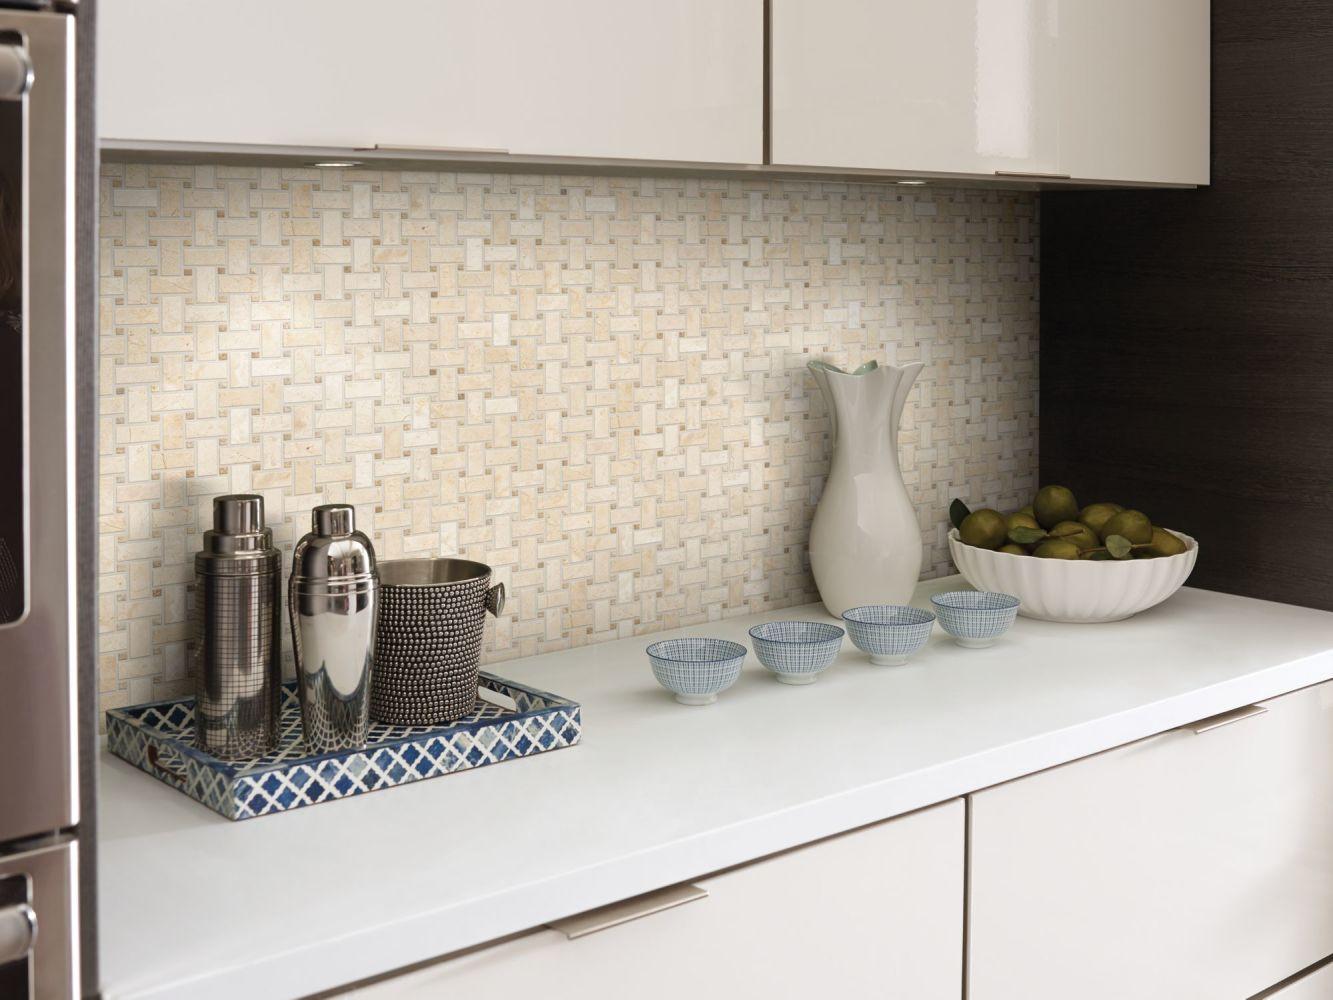 Shaw Floors Home Fn Gold Ceramic Del Ray Basketweave Mosaic Windsurf 00220_TGL27